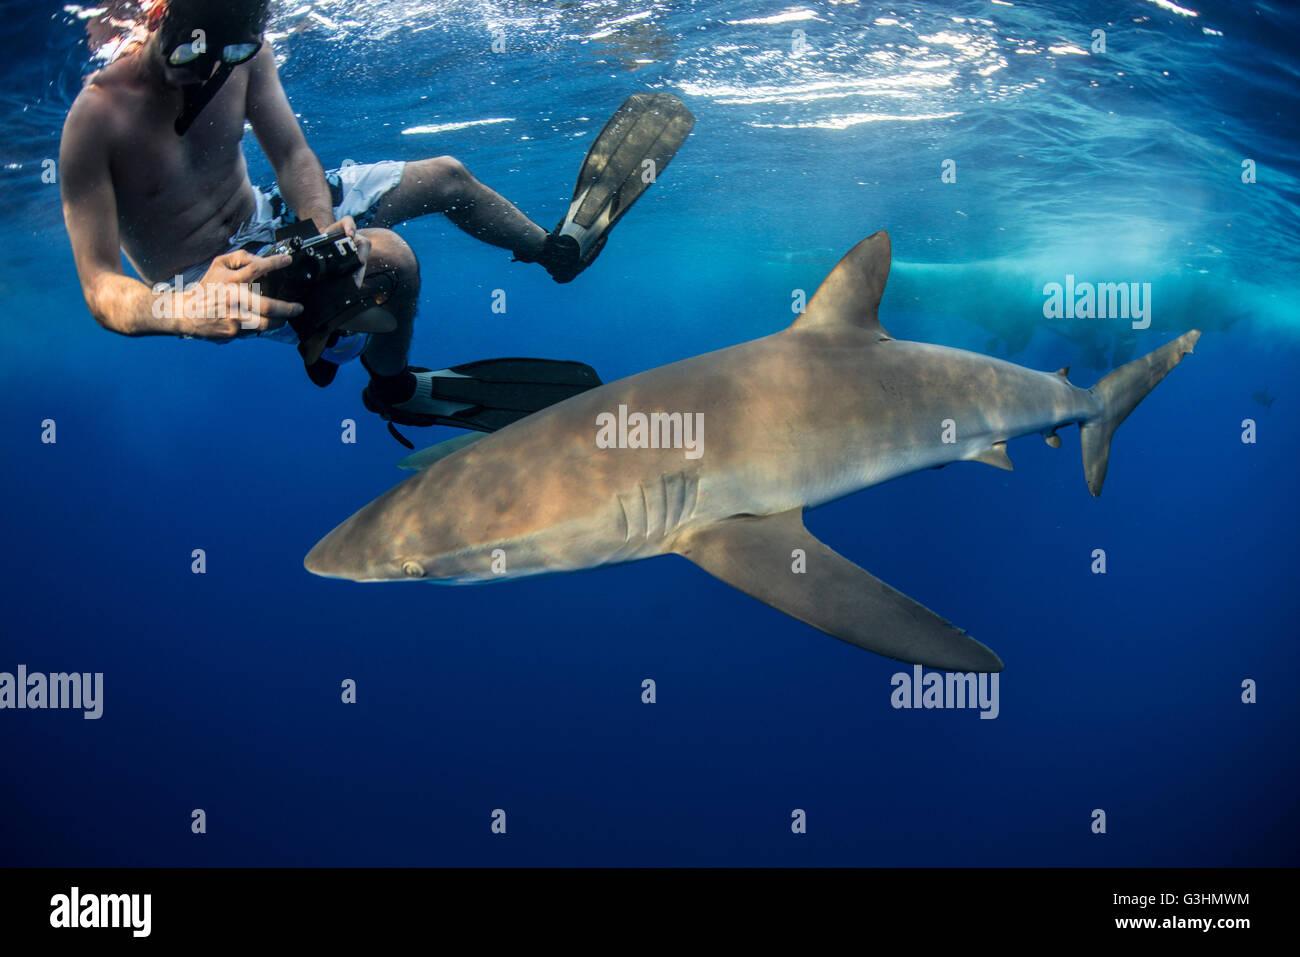 Buceador fotografiar un tiburón sedoso (Carcharhinus falciformis), Roca Partida, Colima, México Imagen De Stock